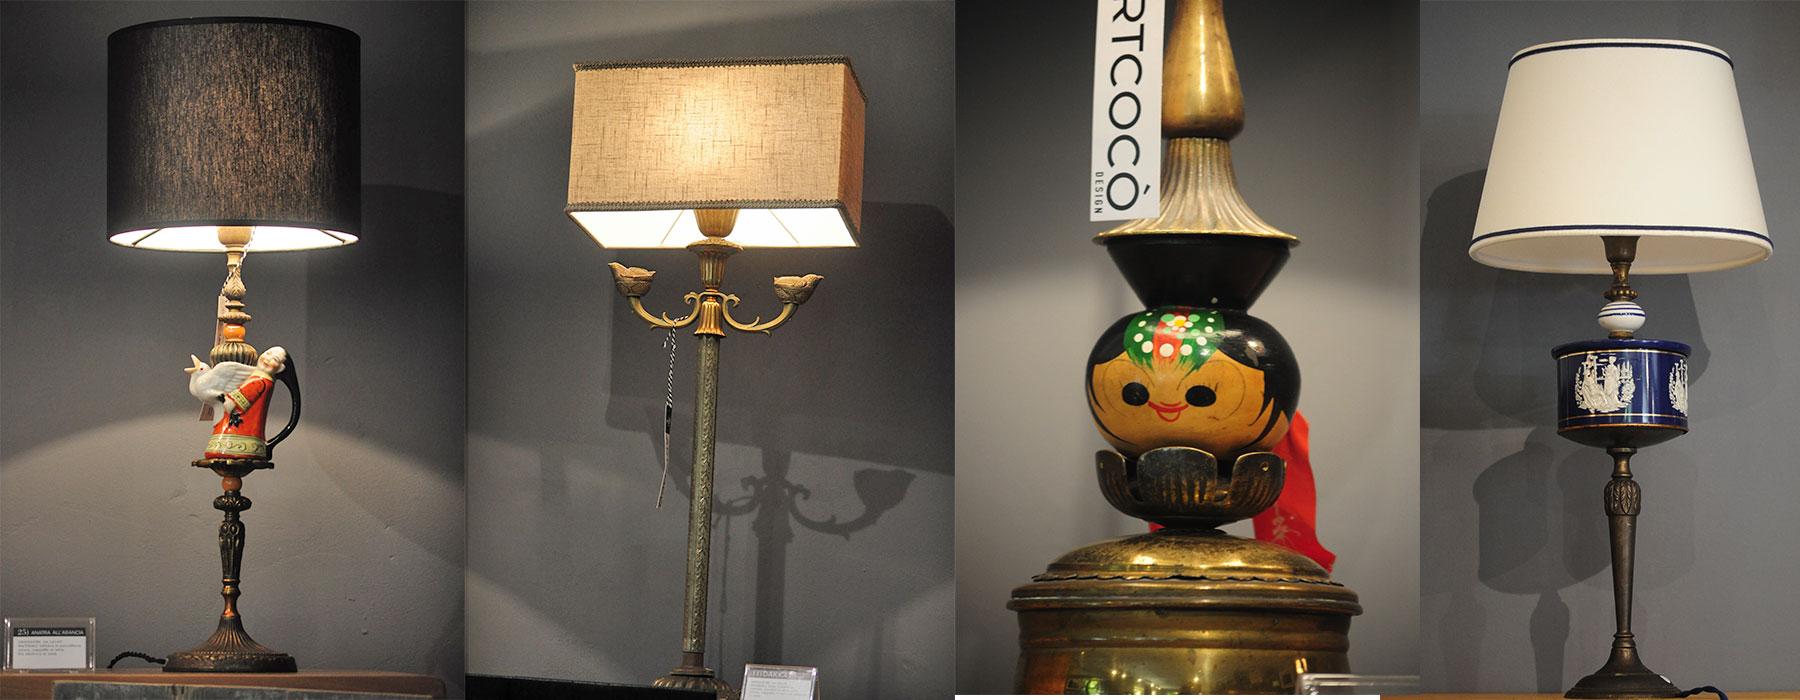 lampade artigianali vintage antiquariato